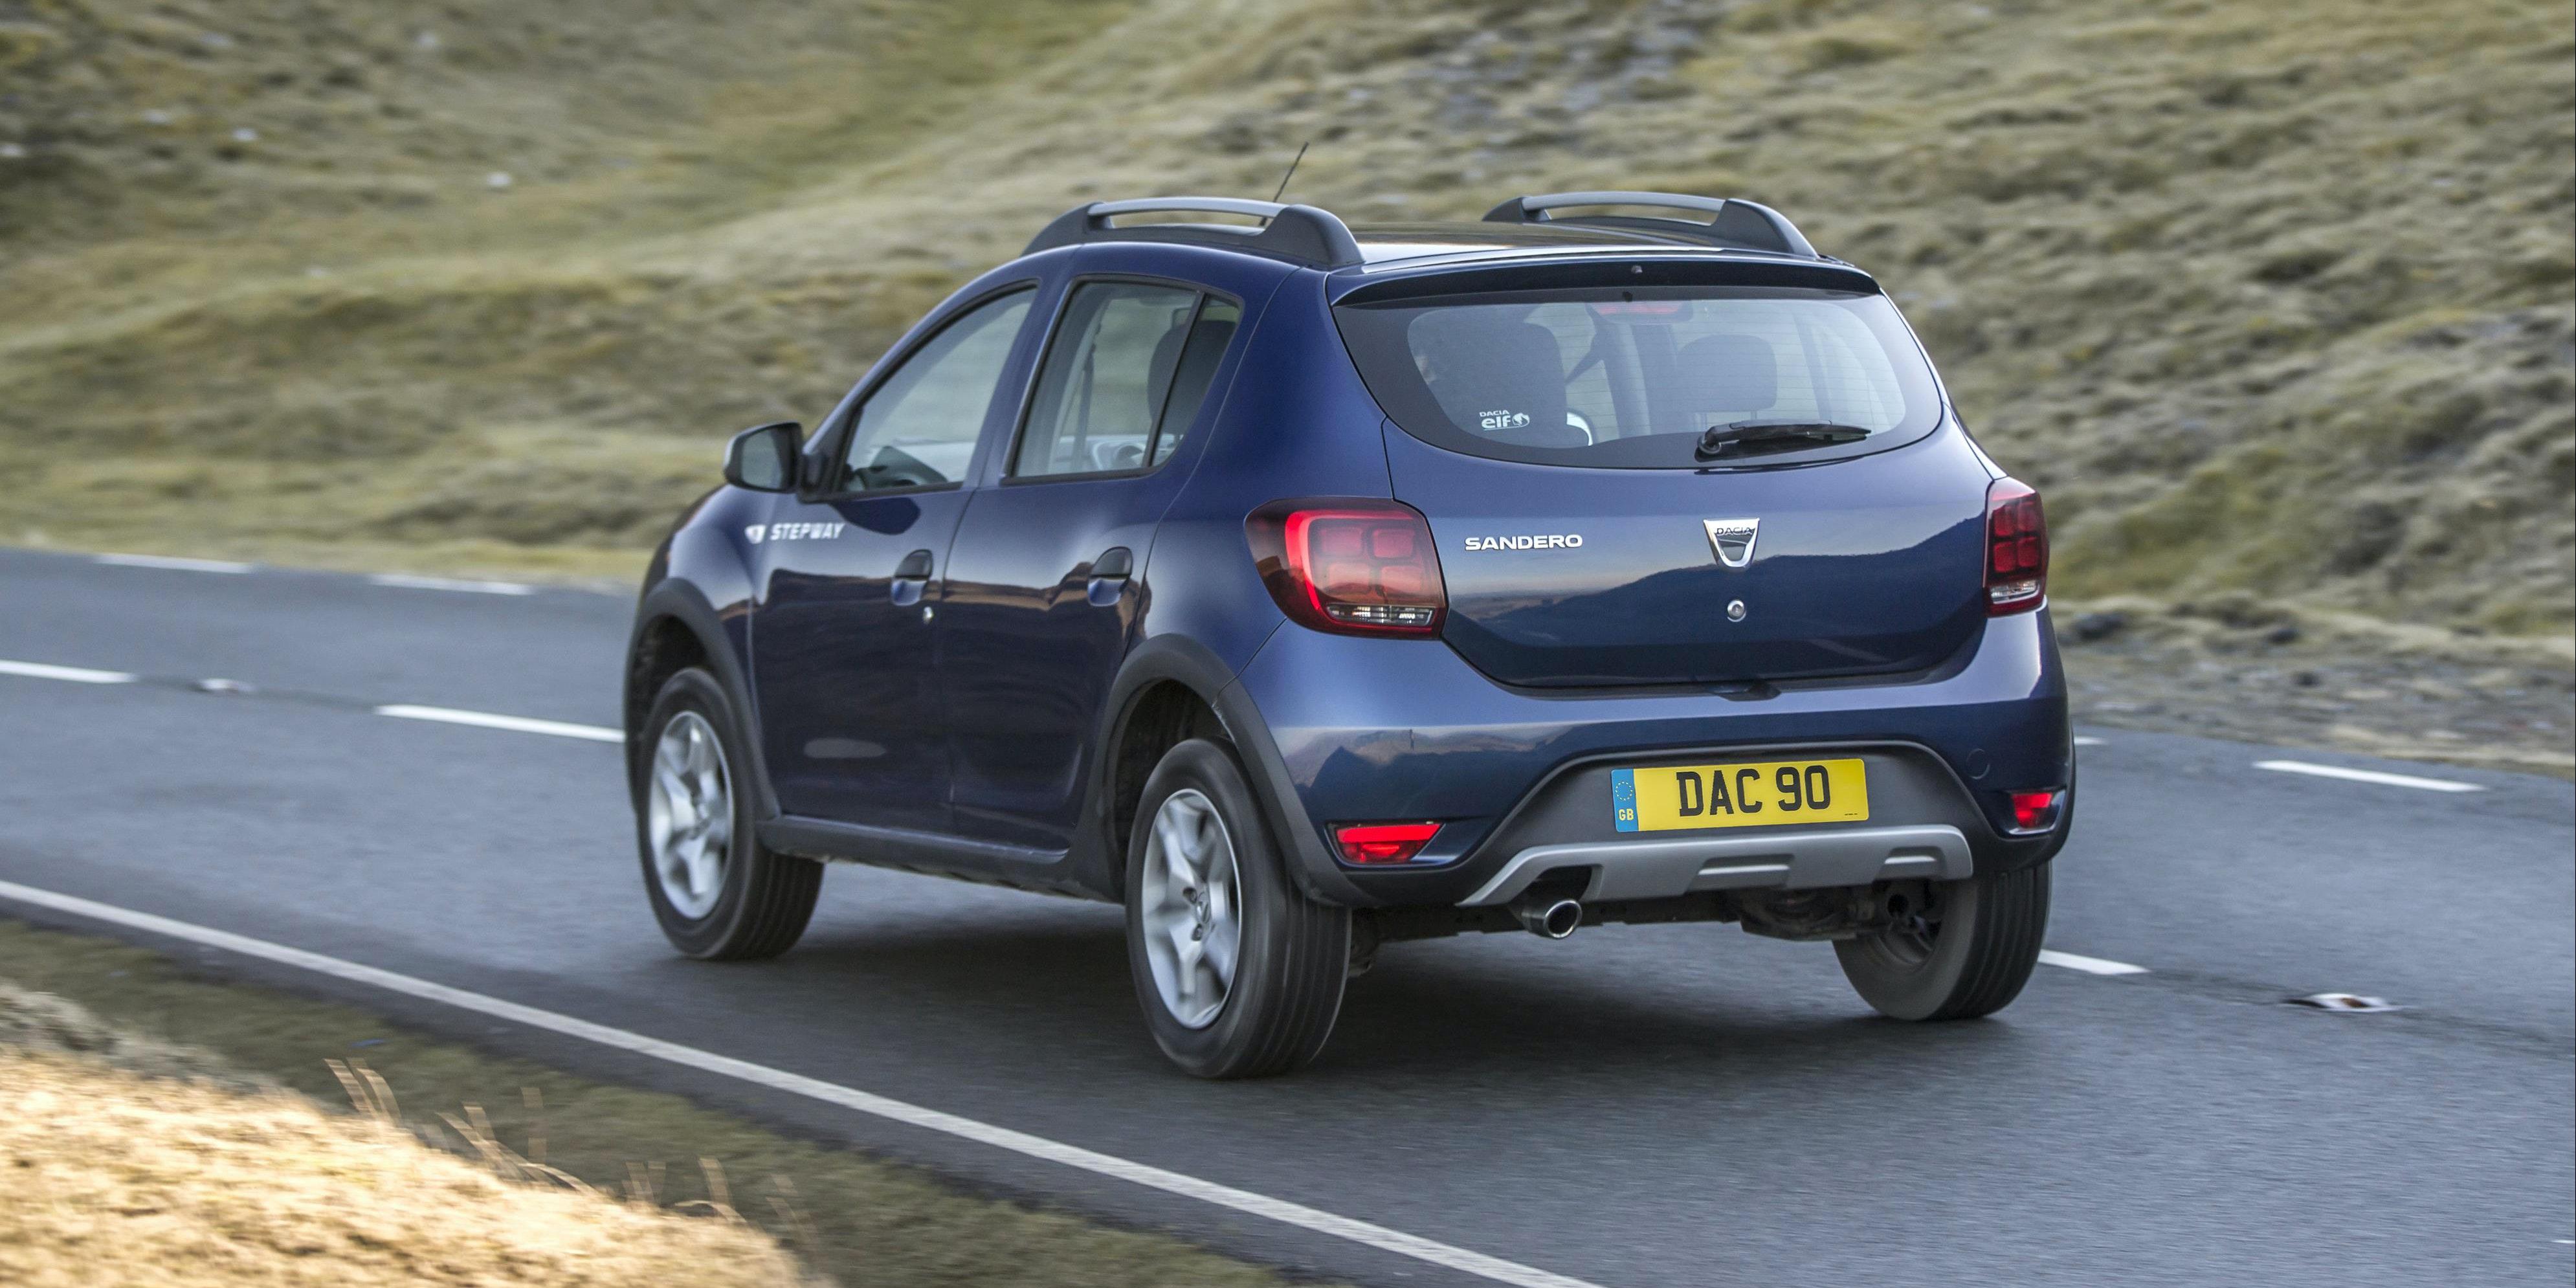 Dacia Sandero Stepway Performance Handling Amp Comfort Carwow